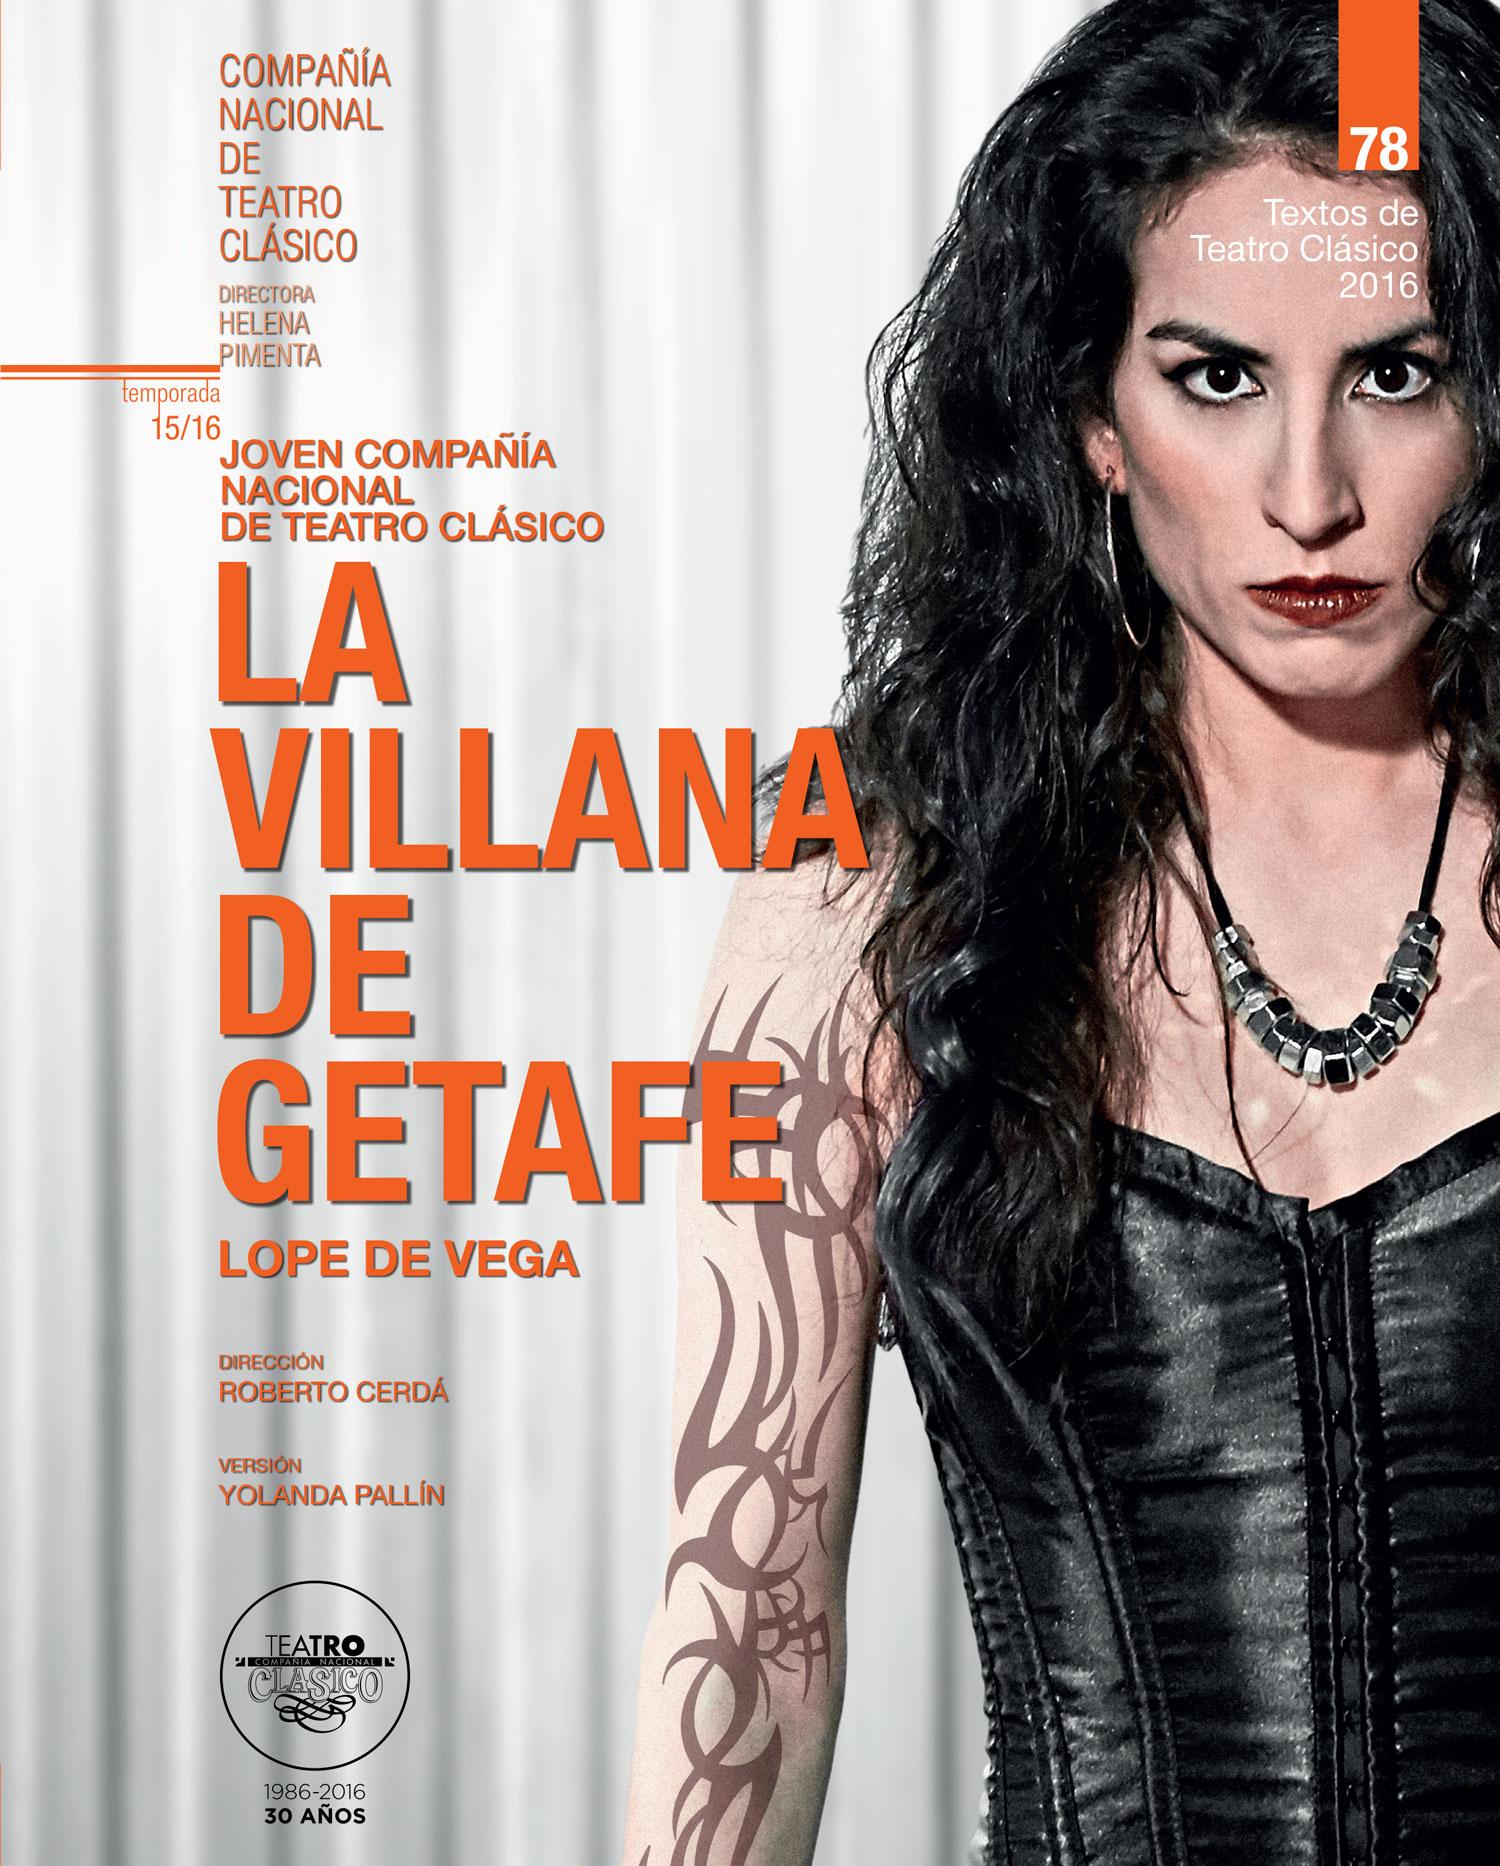 La Villana de Getafe - Nieves Soria